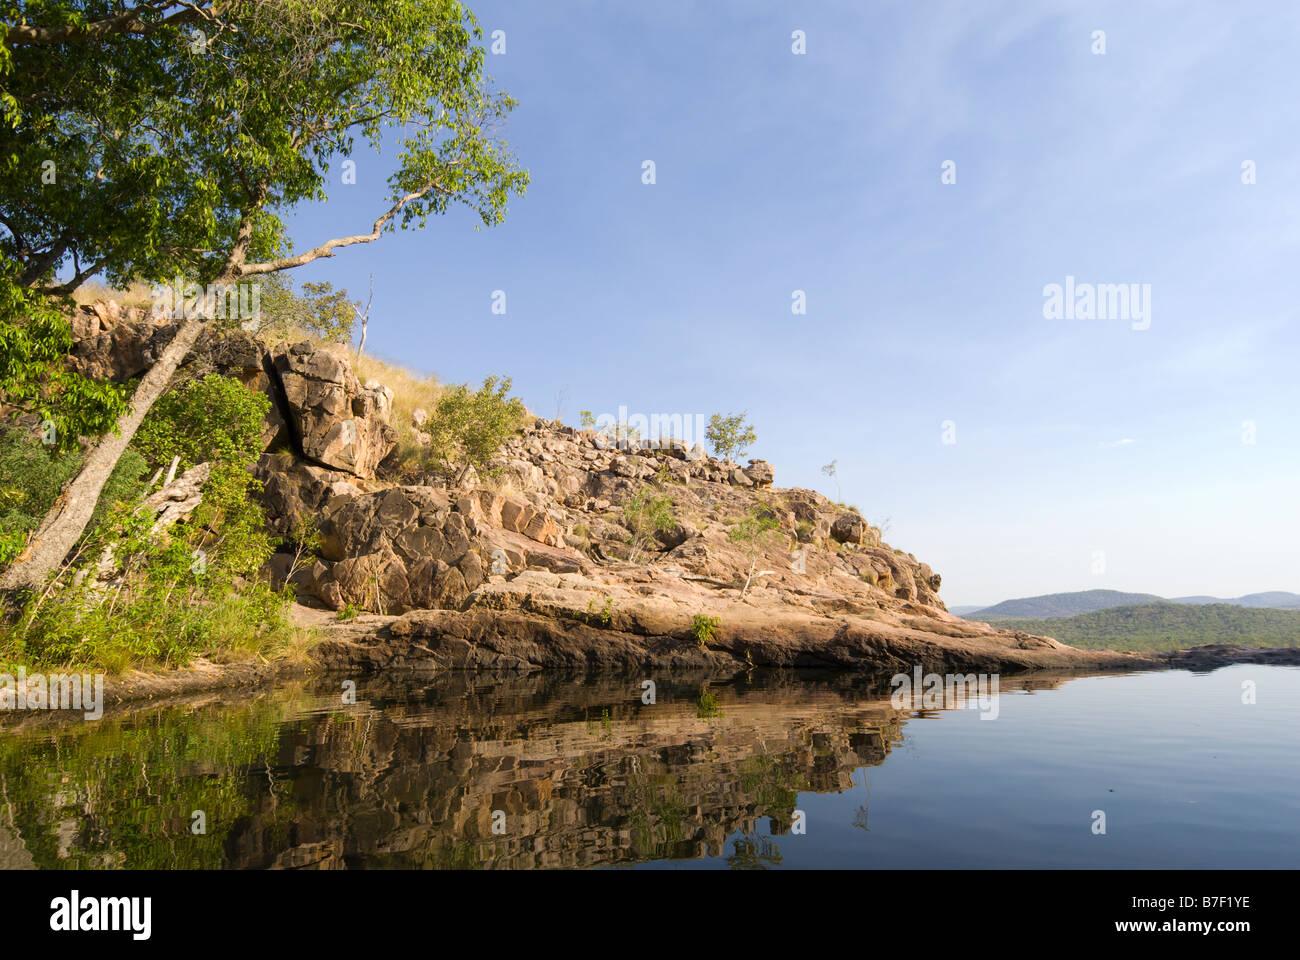 Gunlom plunge pool in Kakadu National Park - Stock Image